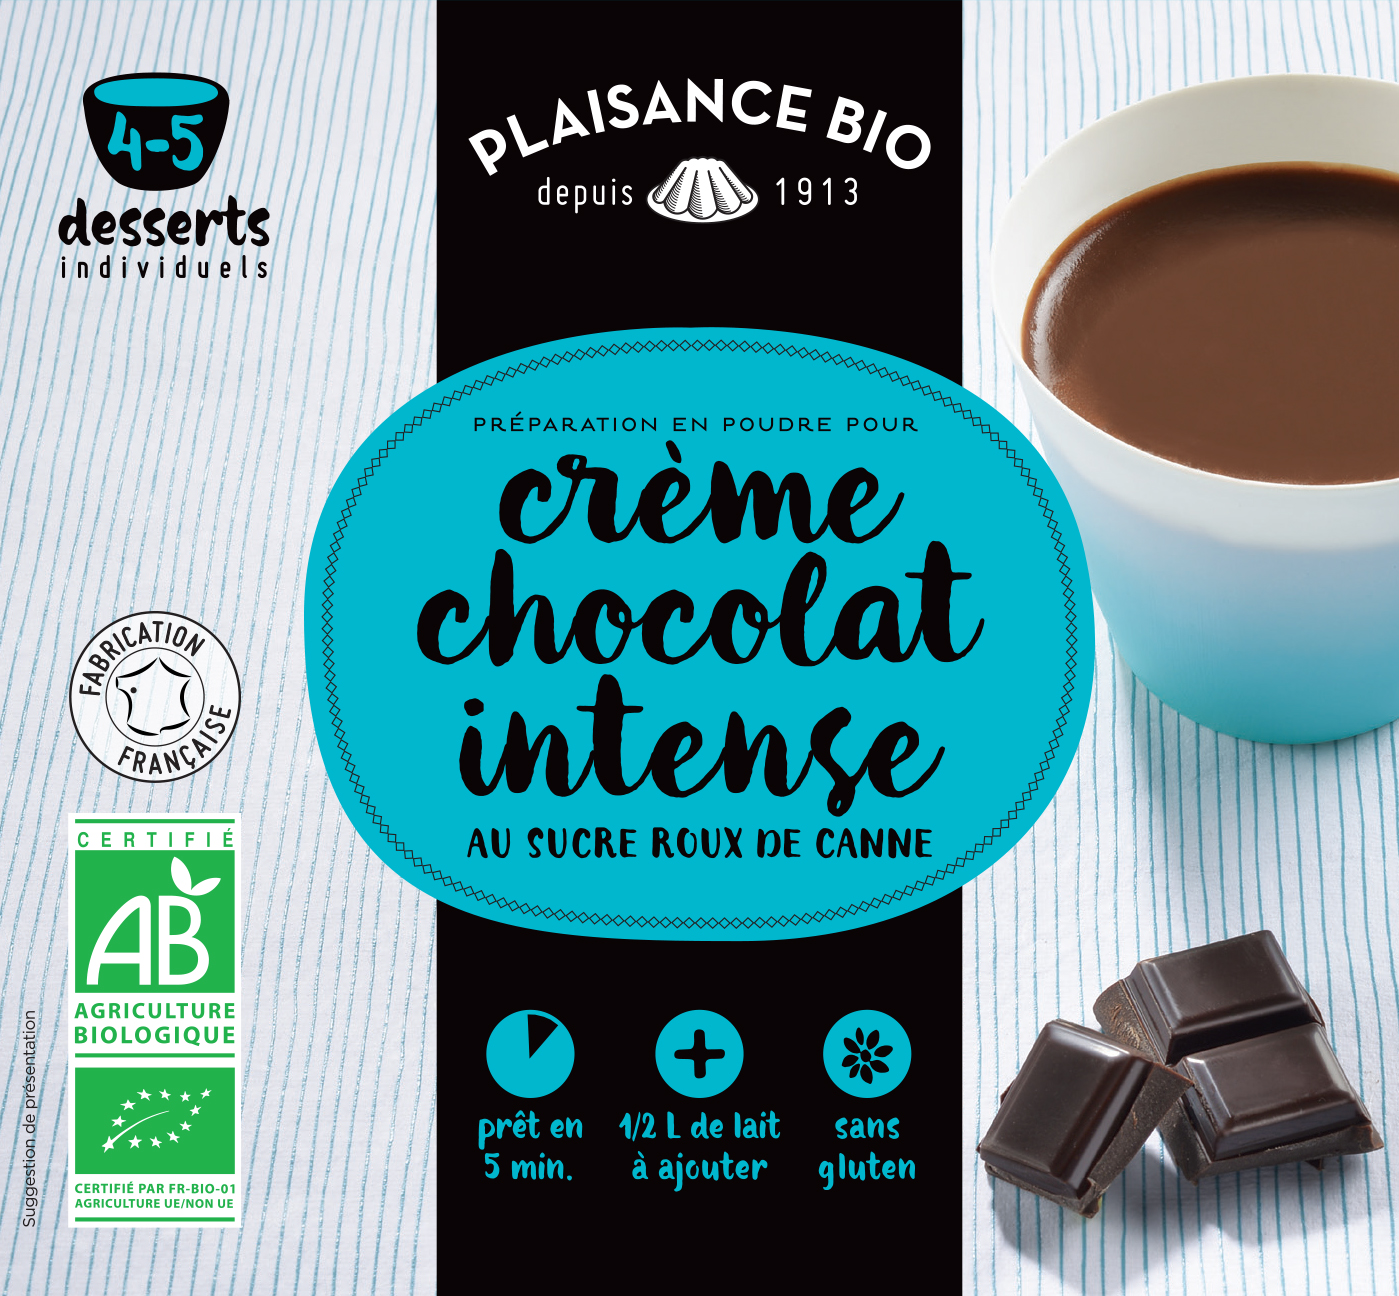 PLAISANCE BIO CREME CHOCOLAT